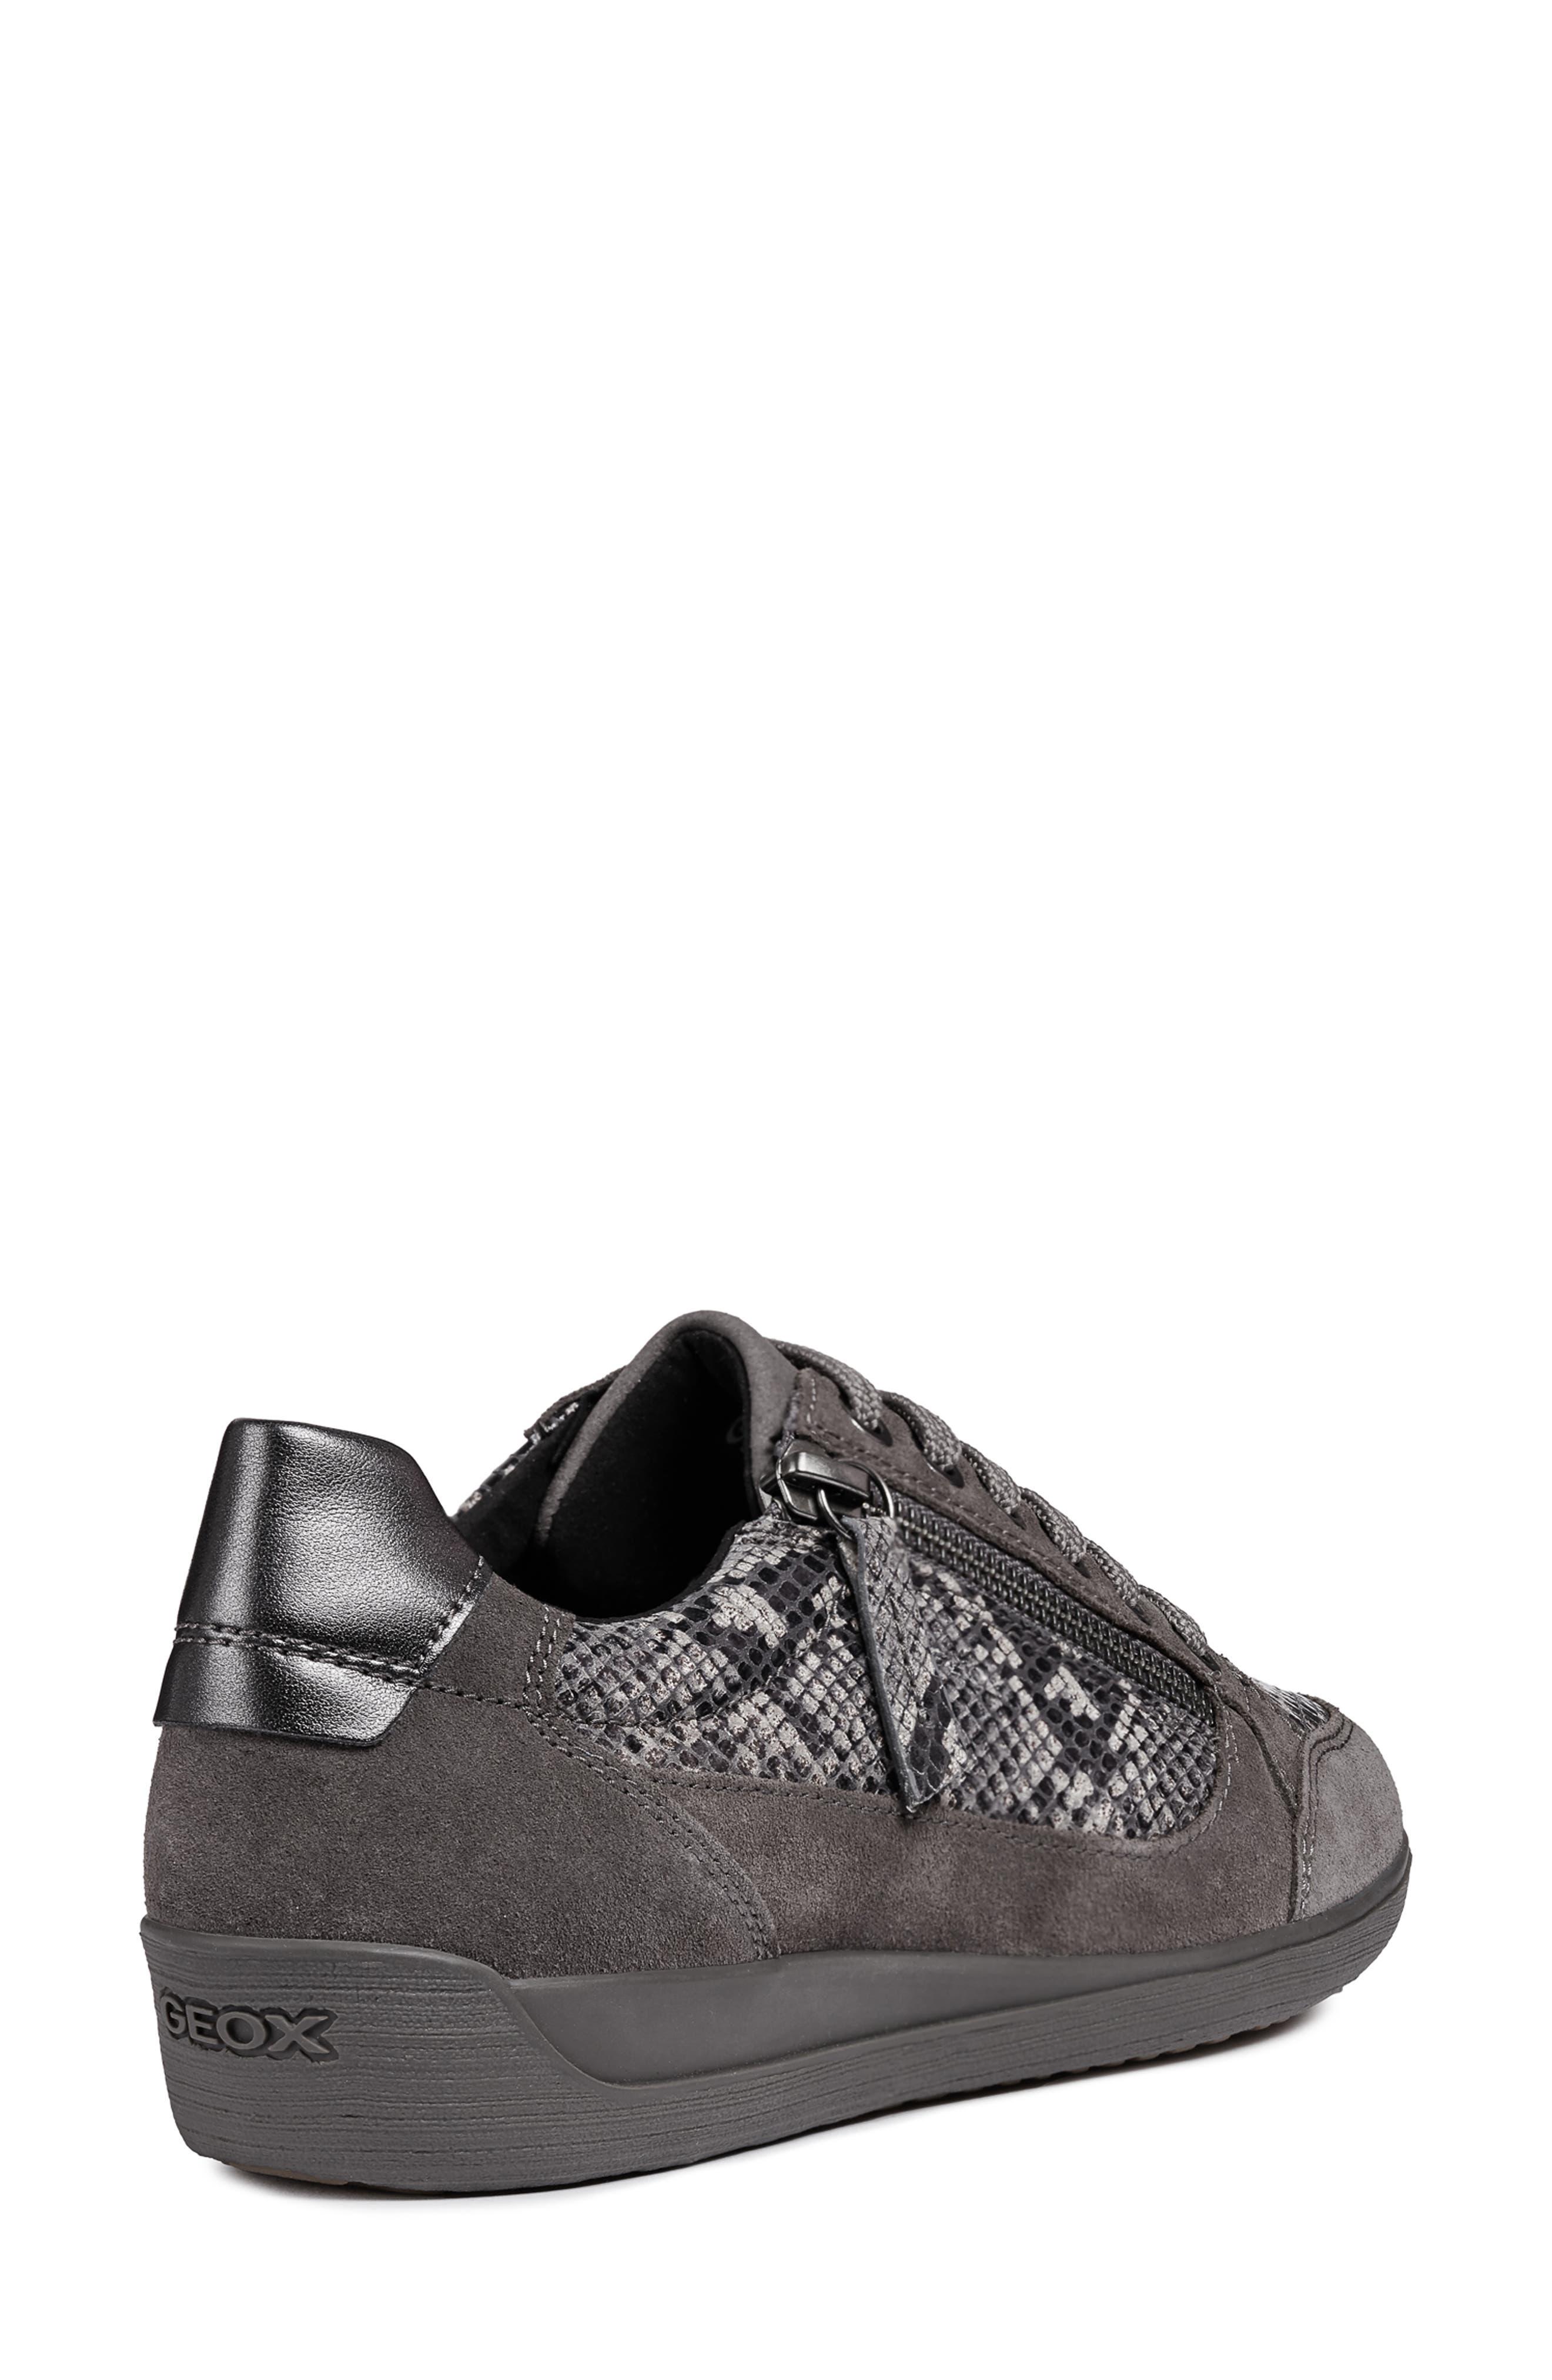 Myria Sneaker,                             Alternate thumbnail 2, color,                             DARK GREY SUEDE